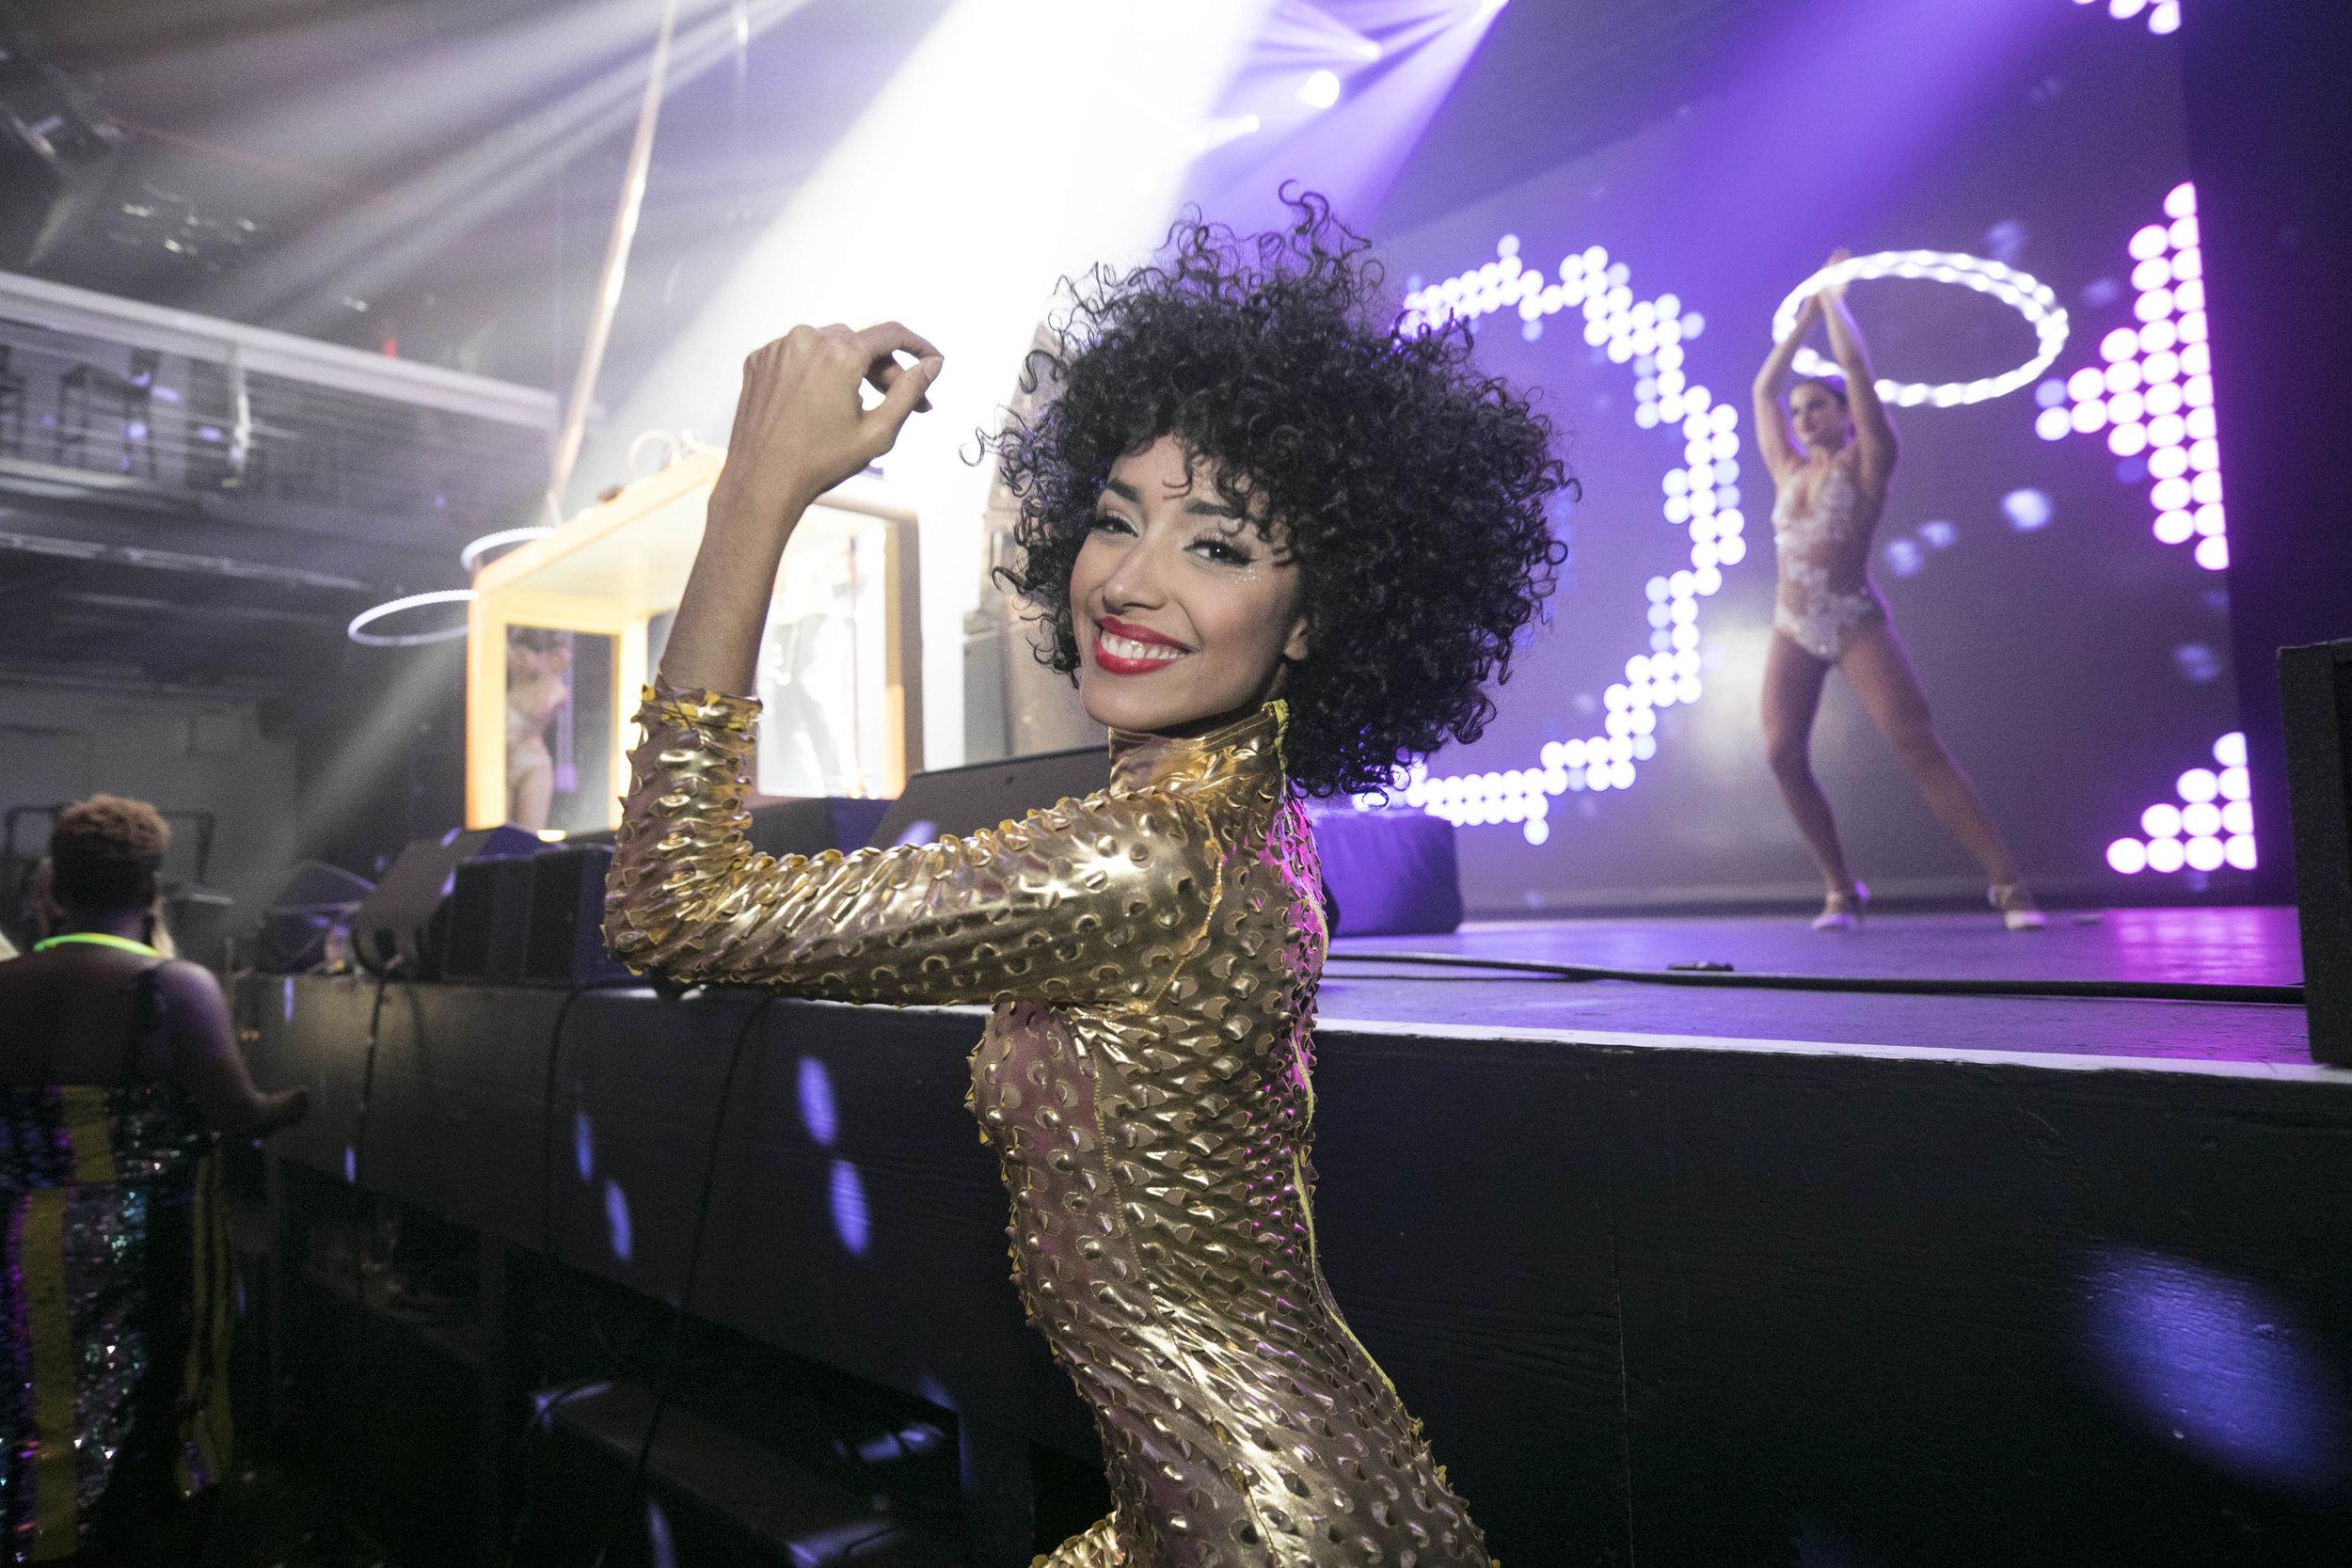 Disco Gogo Dancer